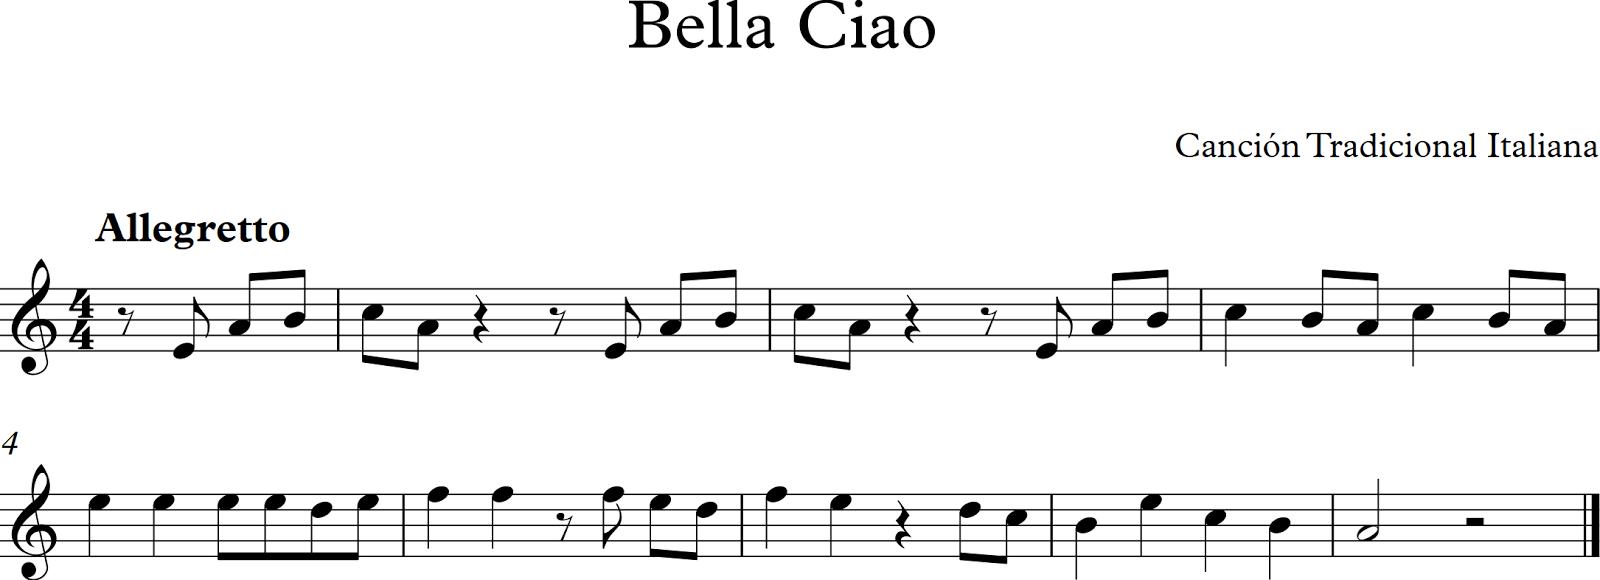 Bella Ciao Png 1600 580 Partituras Partituras Fáceis Partituras Para Trompete